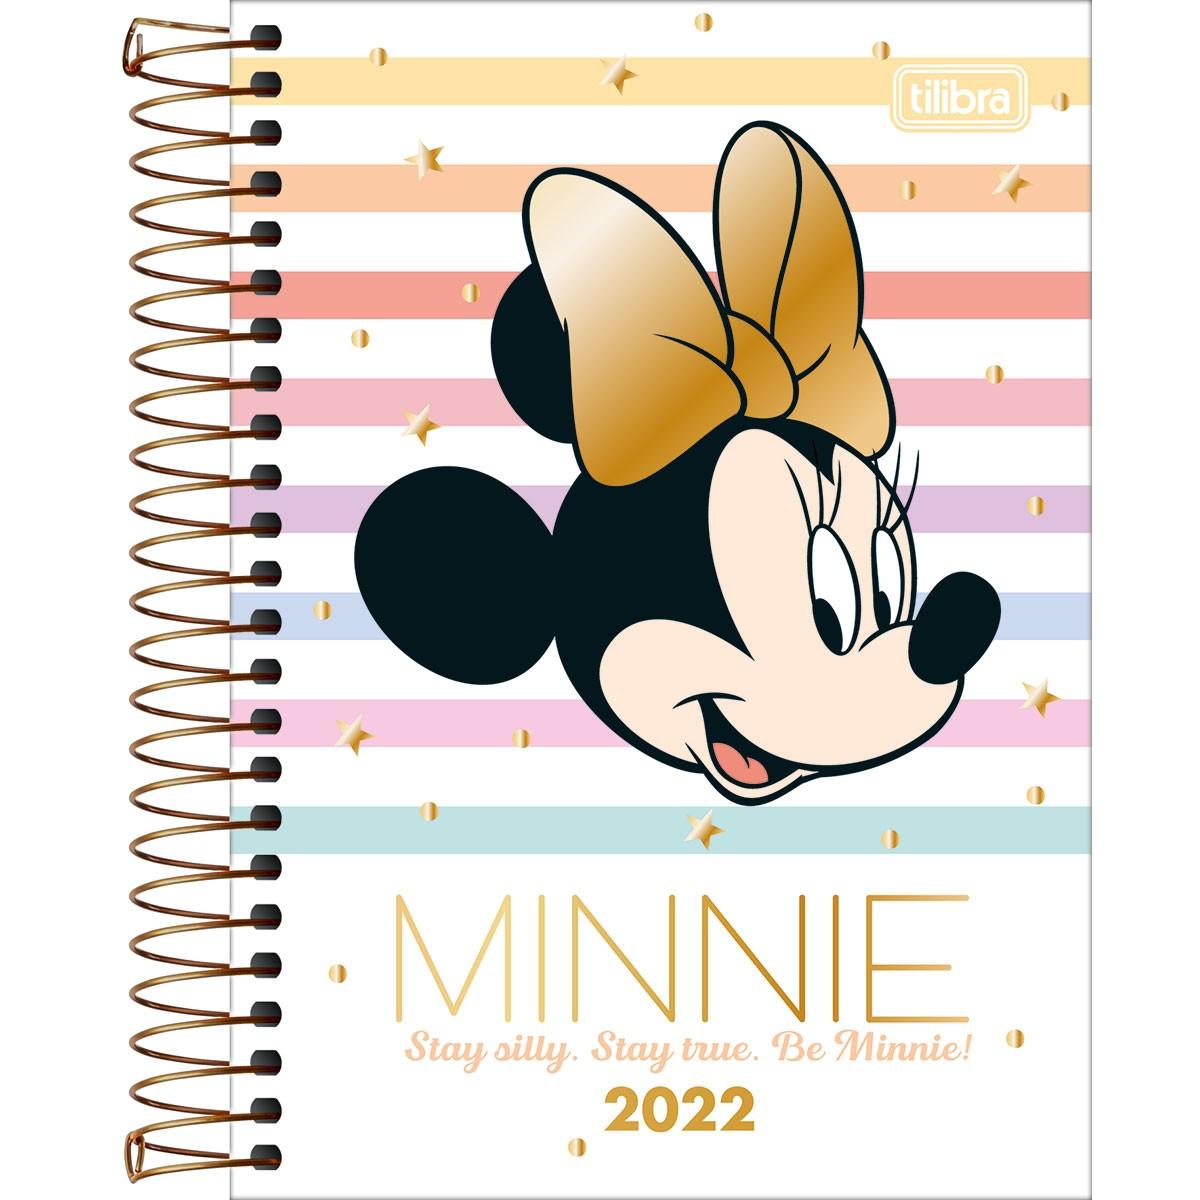 Agenda Diária Minnie 2022 - Tilibra